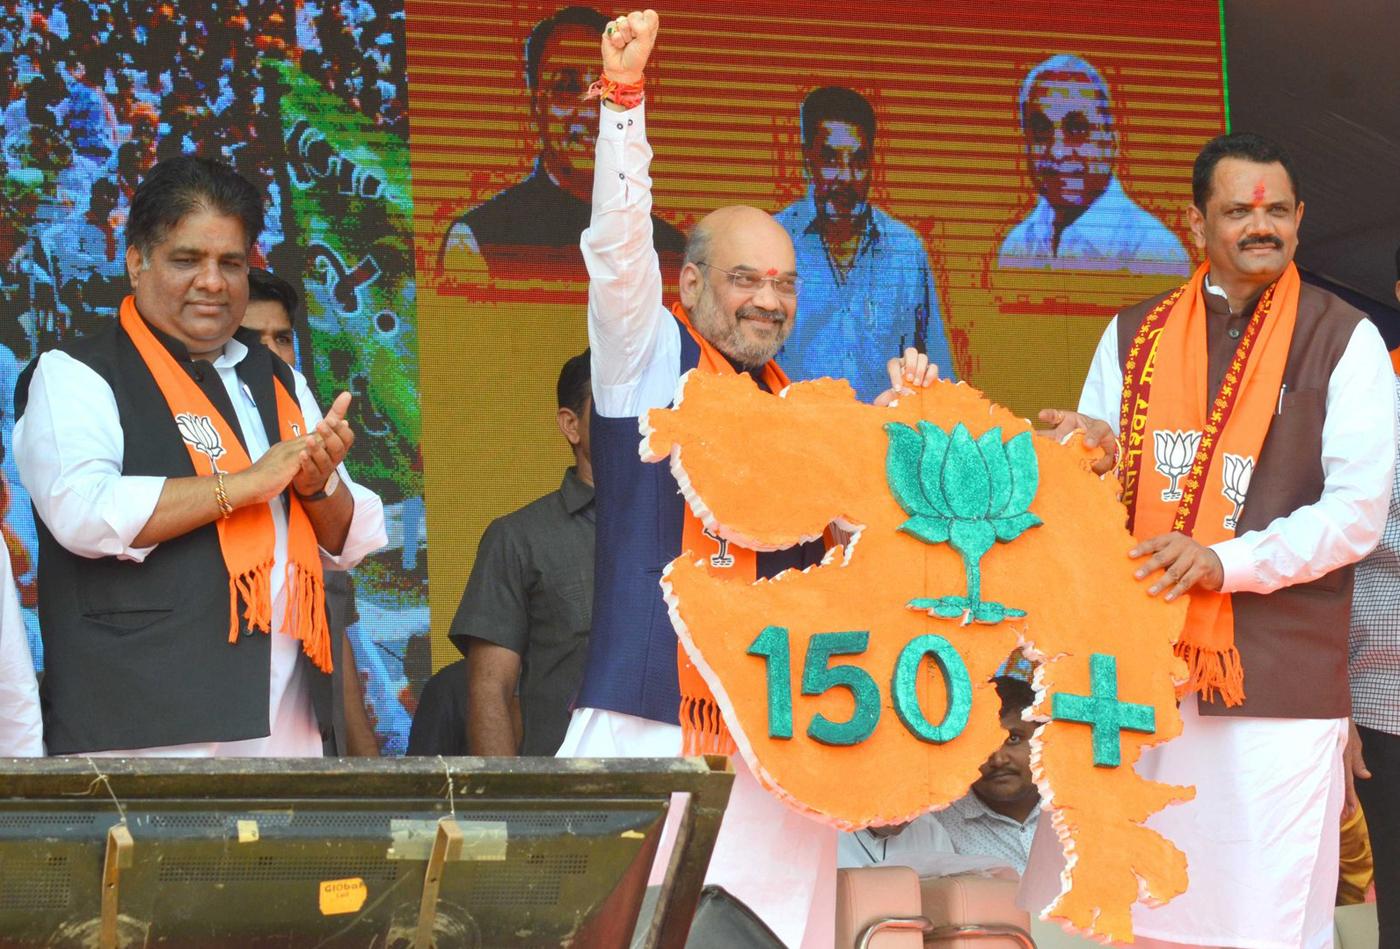 Gujarat election is between Jativad-Vanshvad and Vikasvad: Amit Shah in Bhavnagar